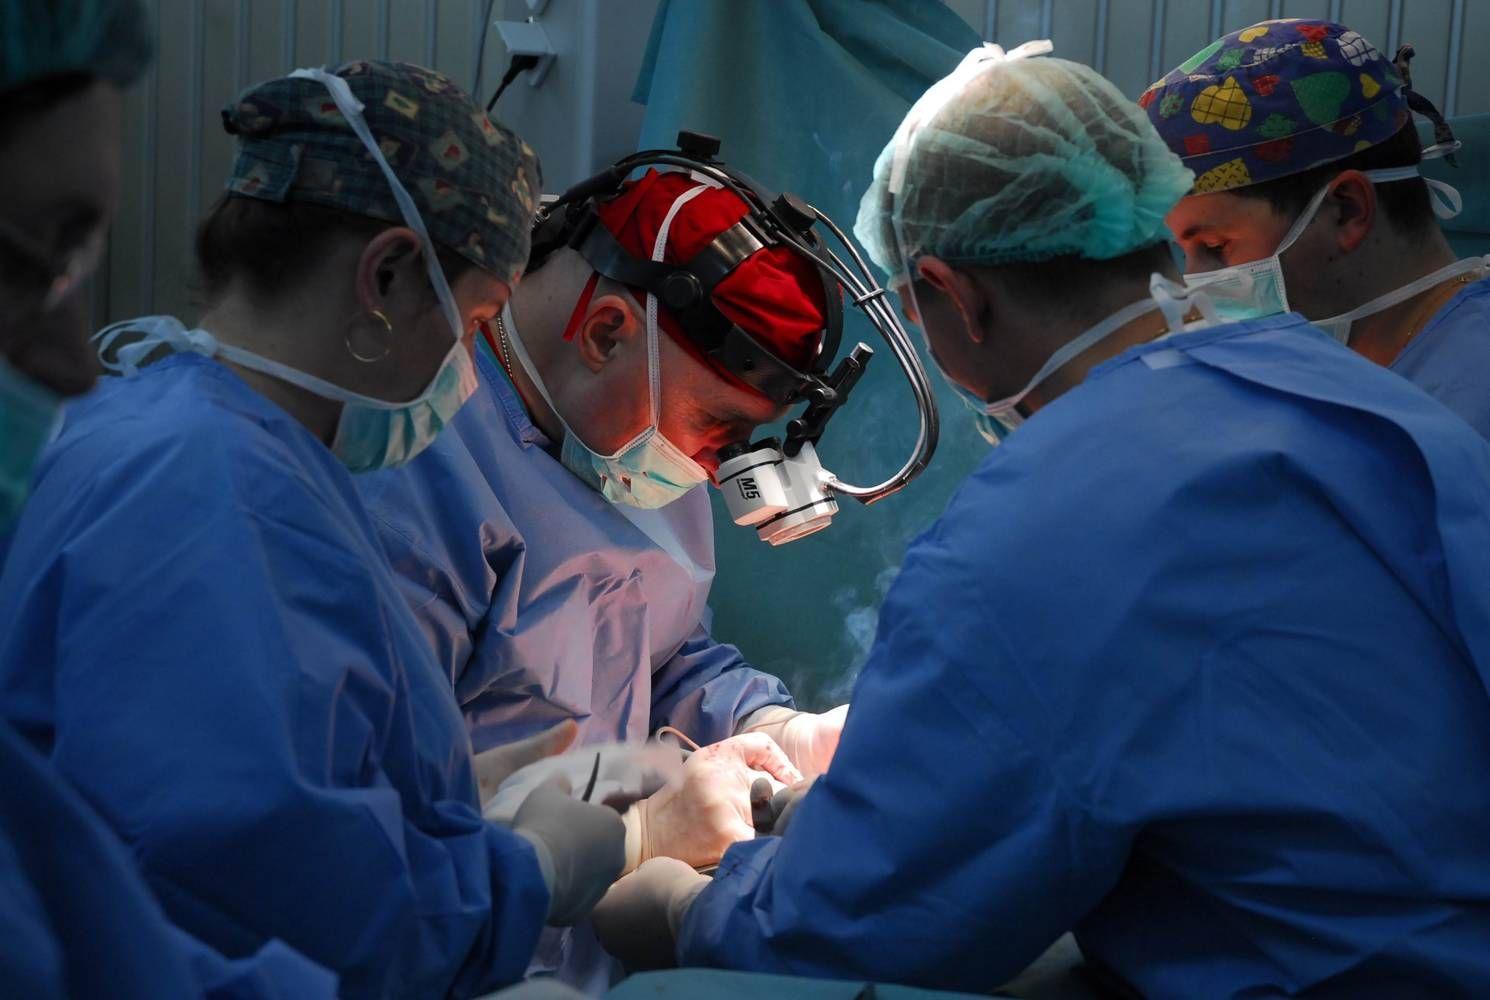 Incredibil! Transplant de şase organe